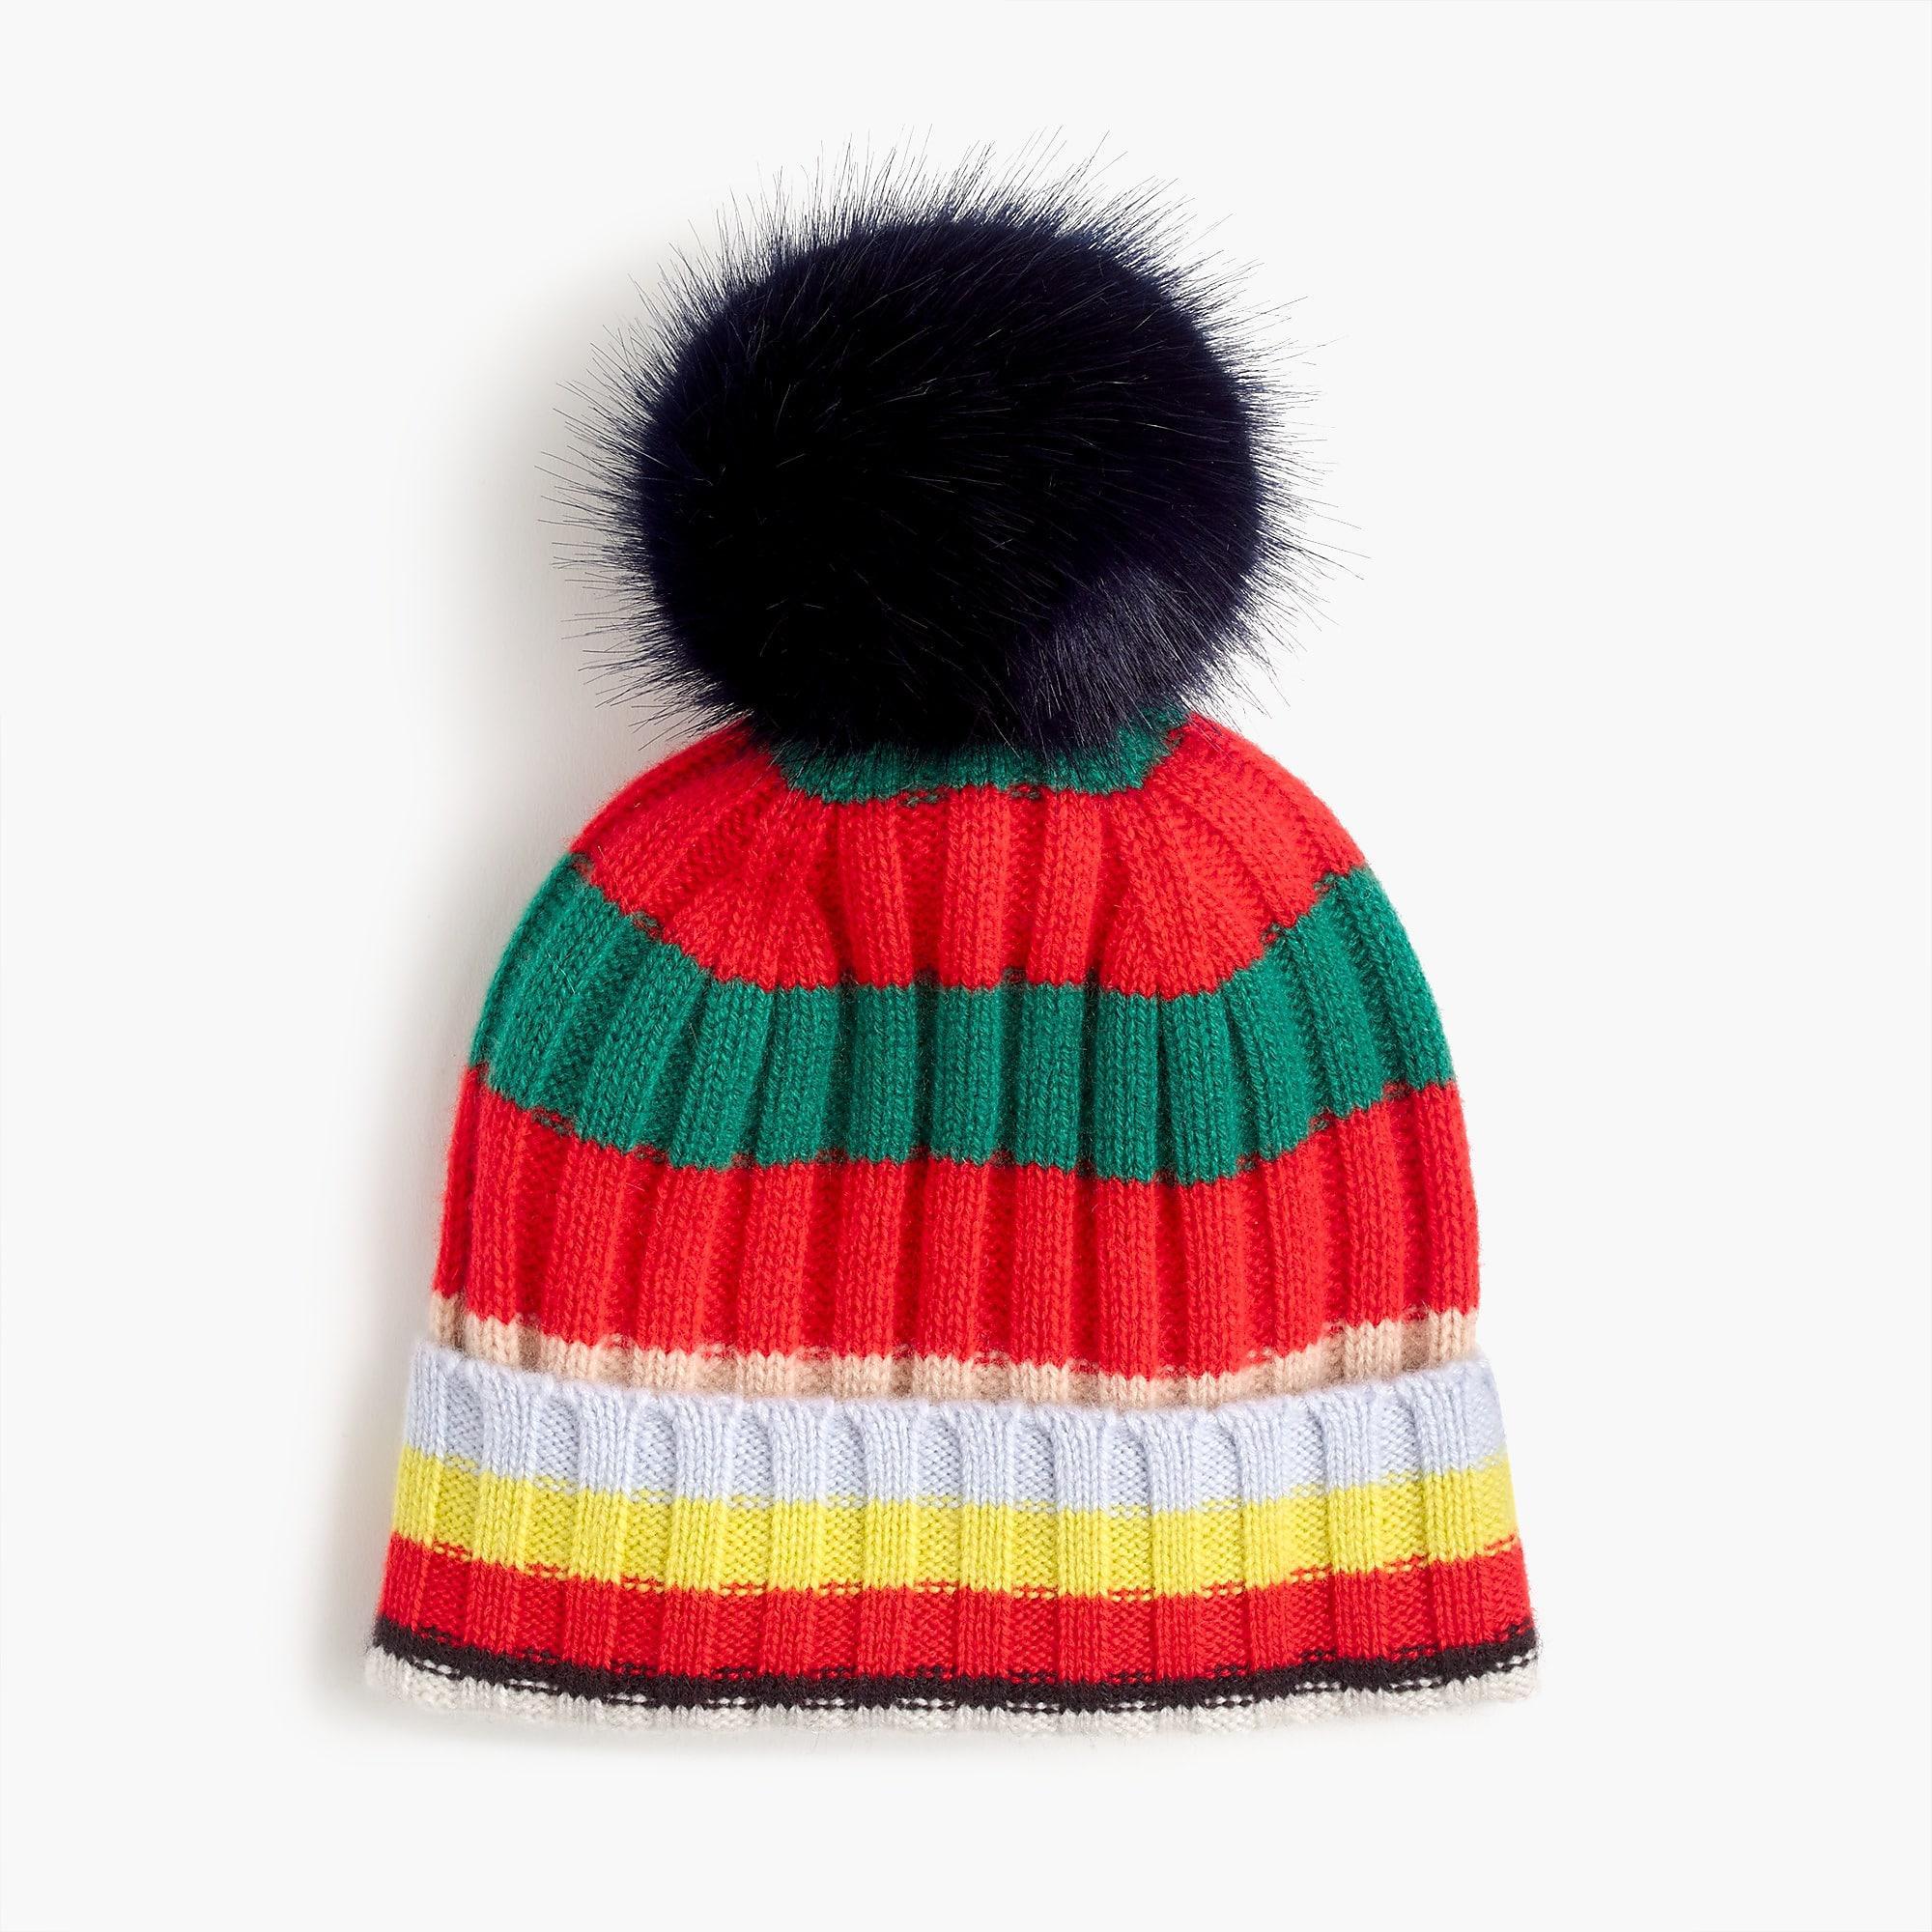 8eeb983e3fff4 J.Crew - Blue Pom Pom Hat In Striped Everyday Cashmere - Lyst. View  fullscreen